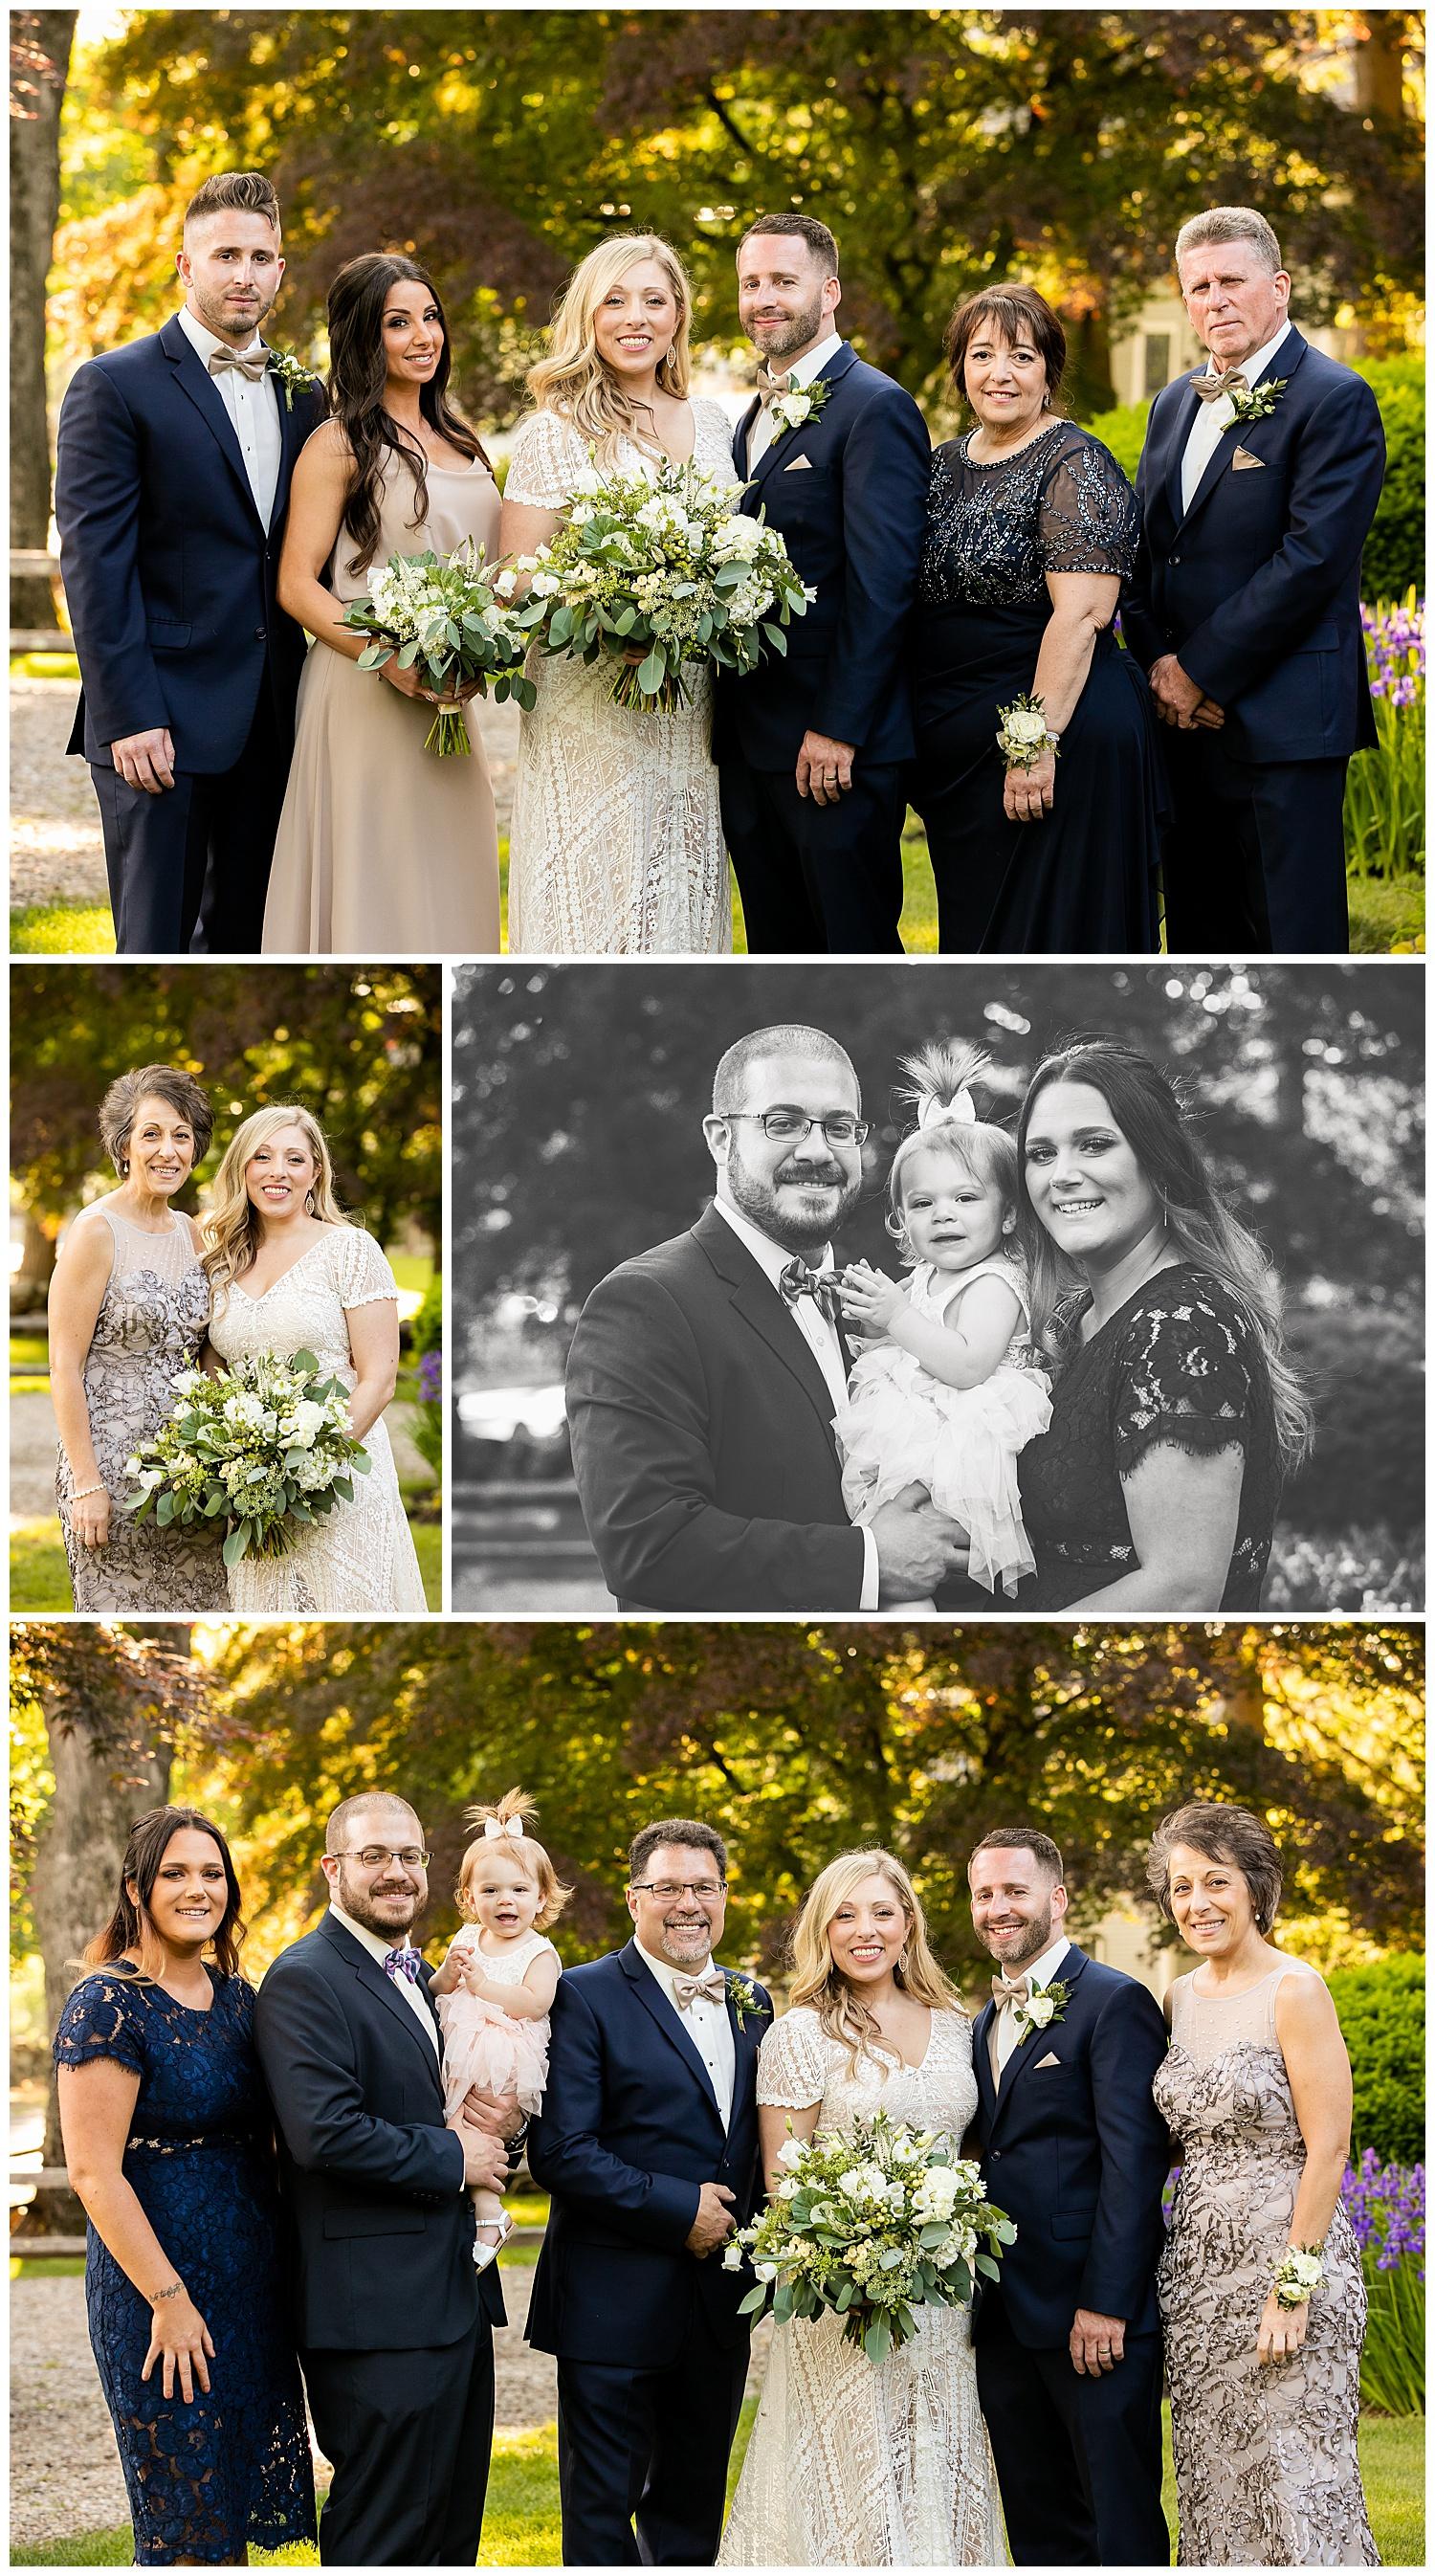 Family & Wedding Party,social media,